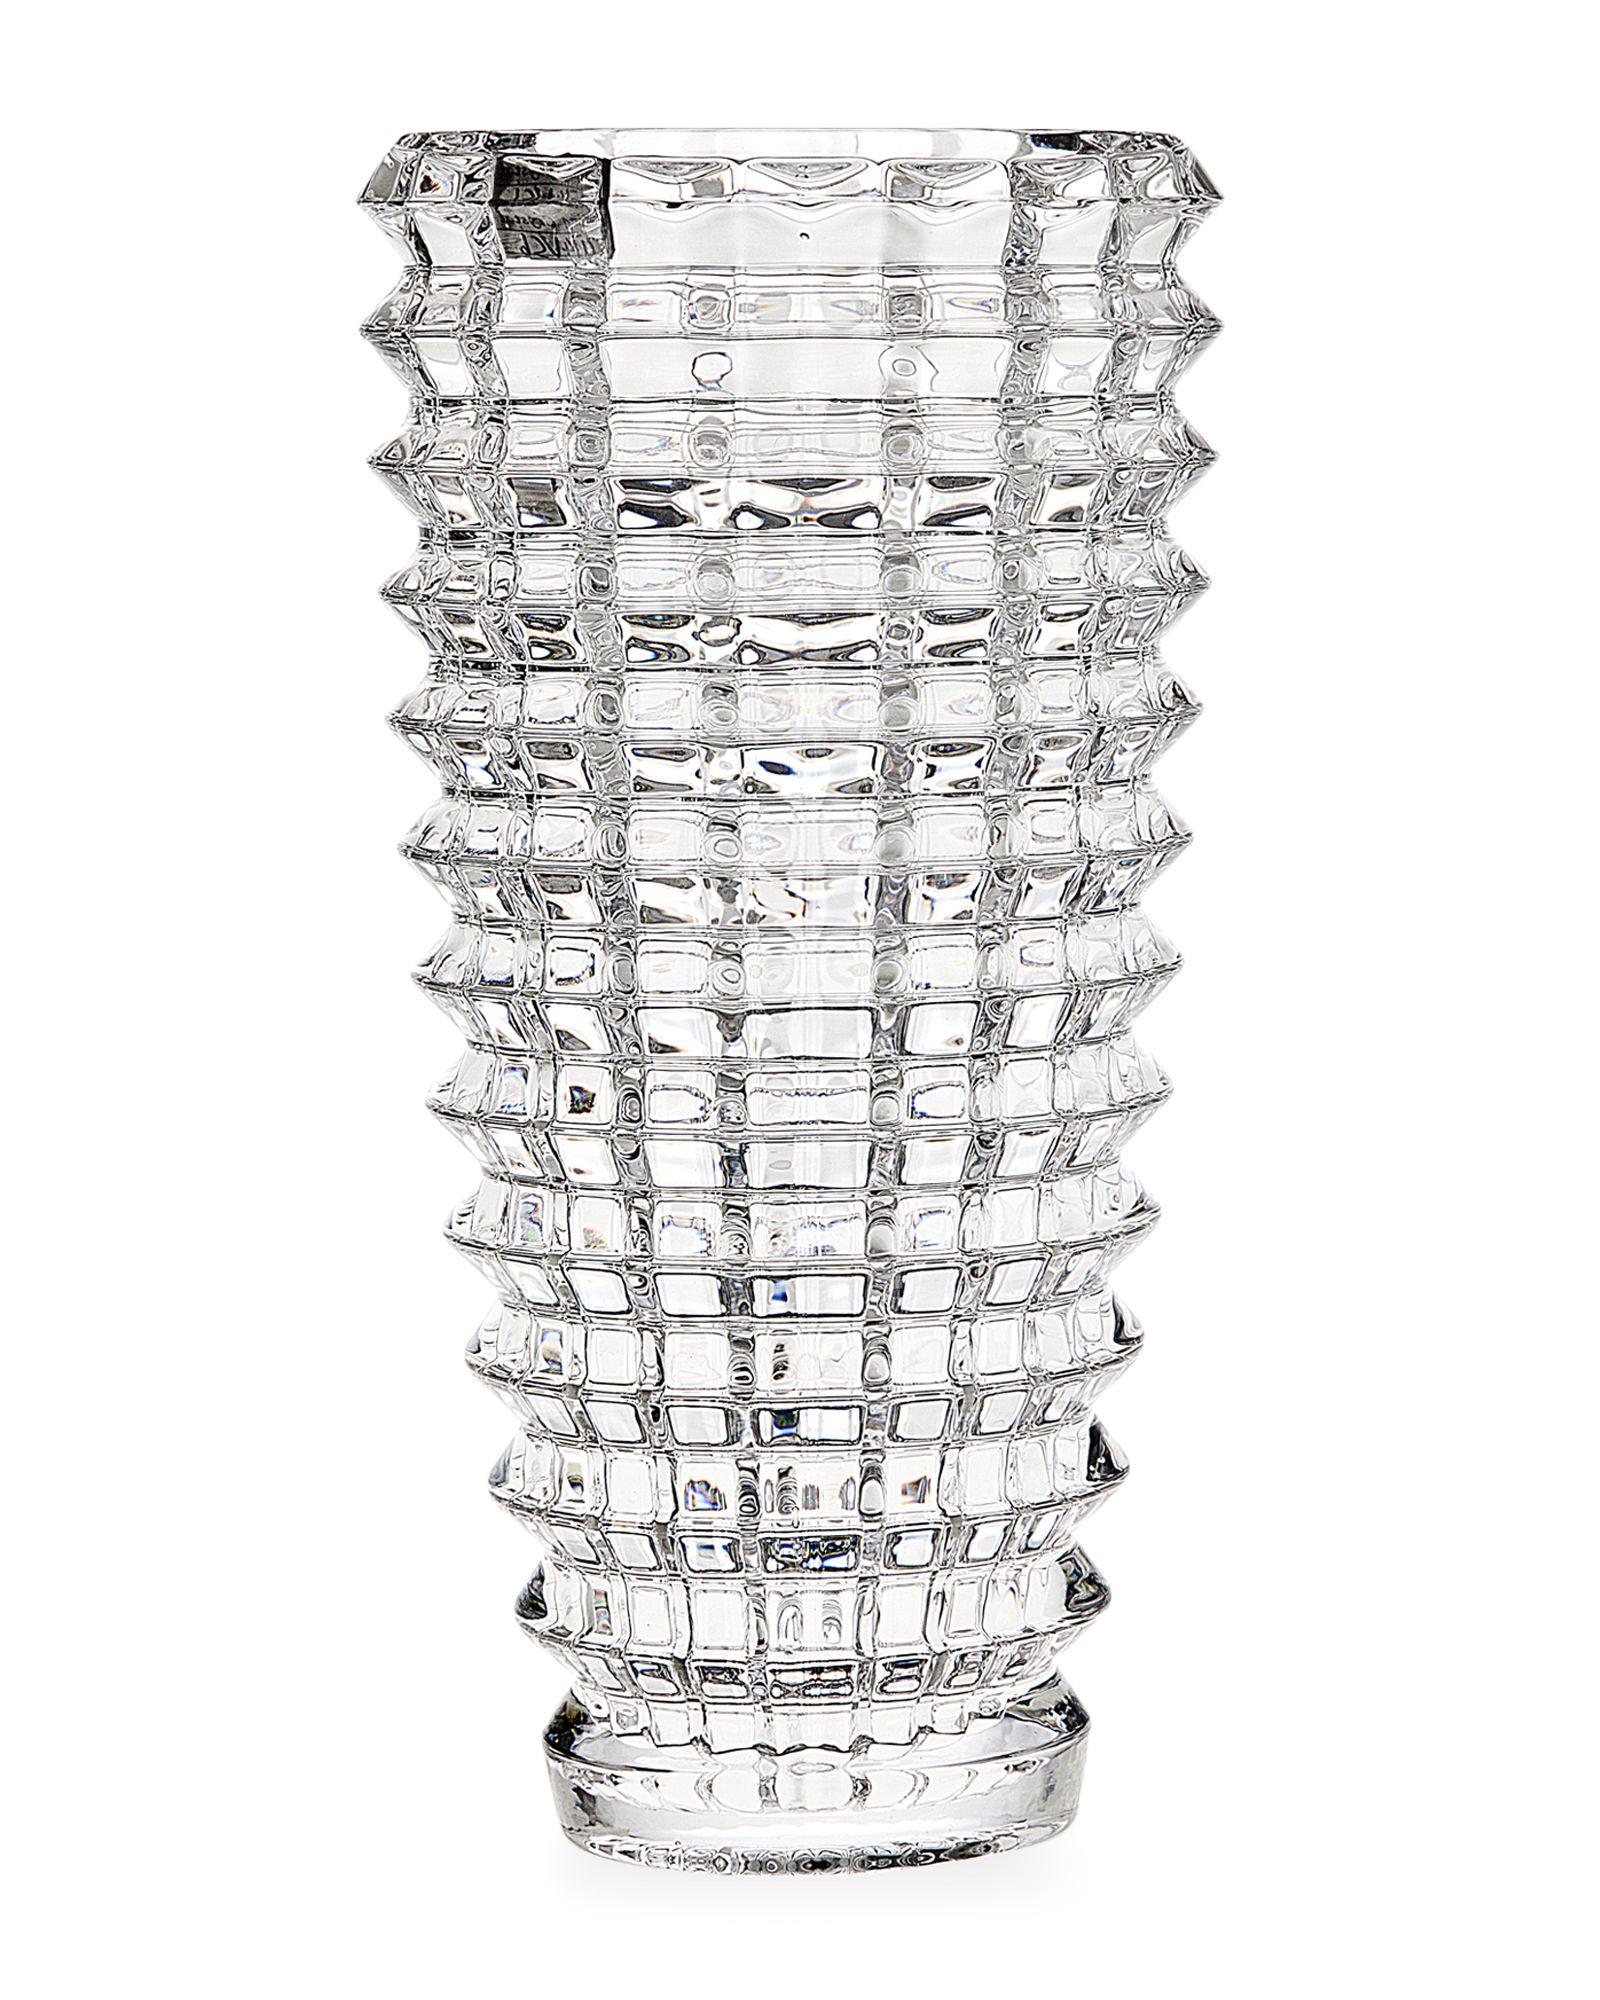 15 Spectacular Shannon Crystal by Godinger Vase 2021 free download shannon crystal by godinger vase of century crystal vase home garden pinterest avon vase and home for shannon by godinger century crystal vase